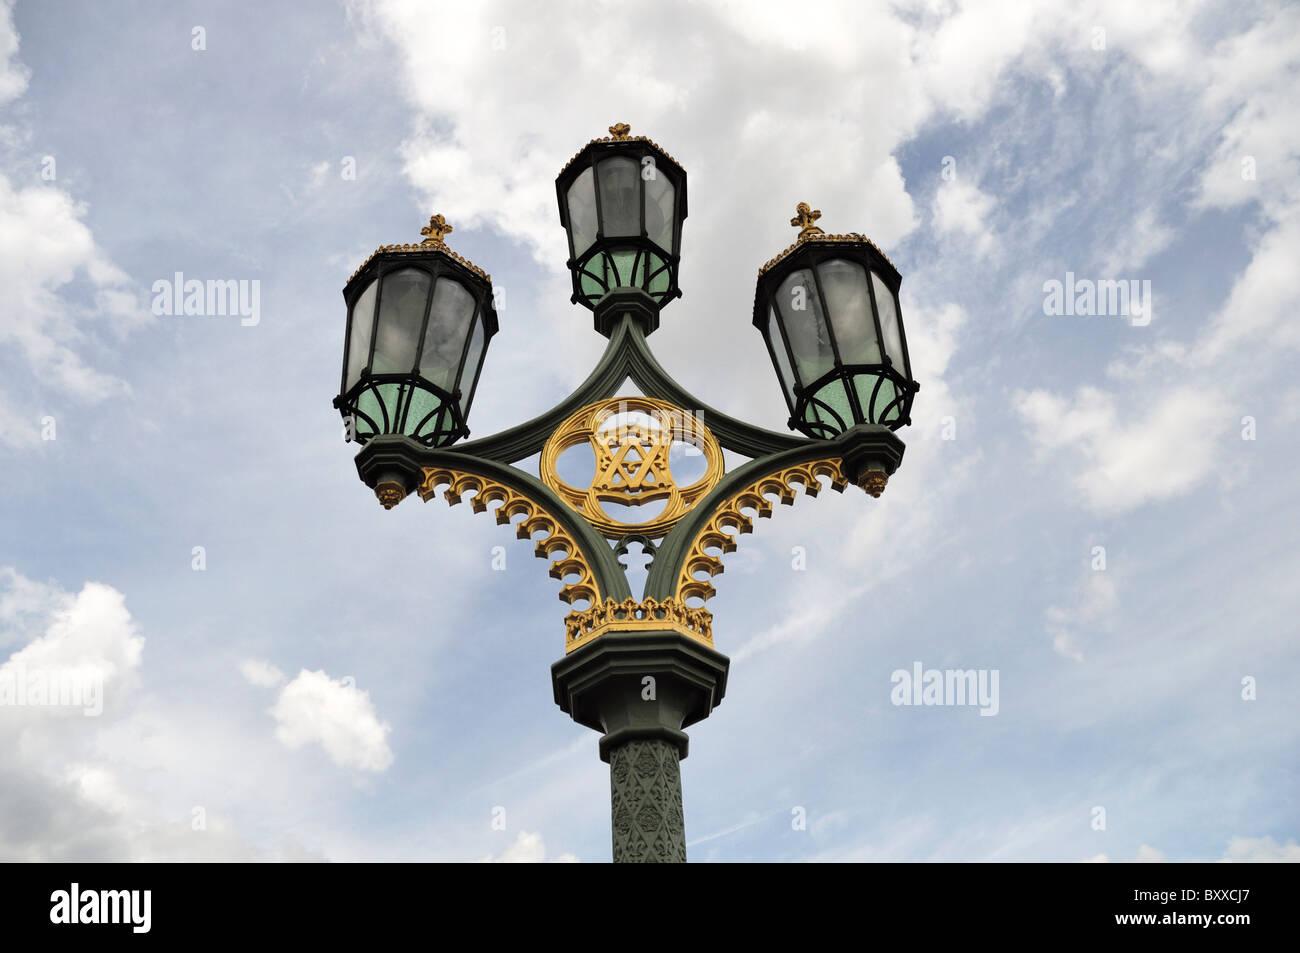 A London streetlight. - Stock Image